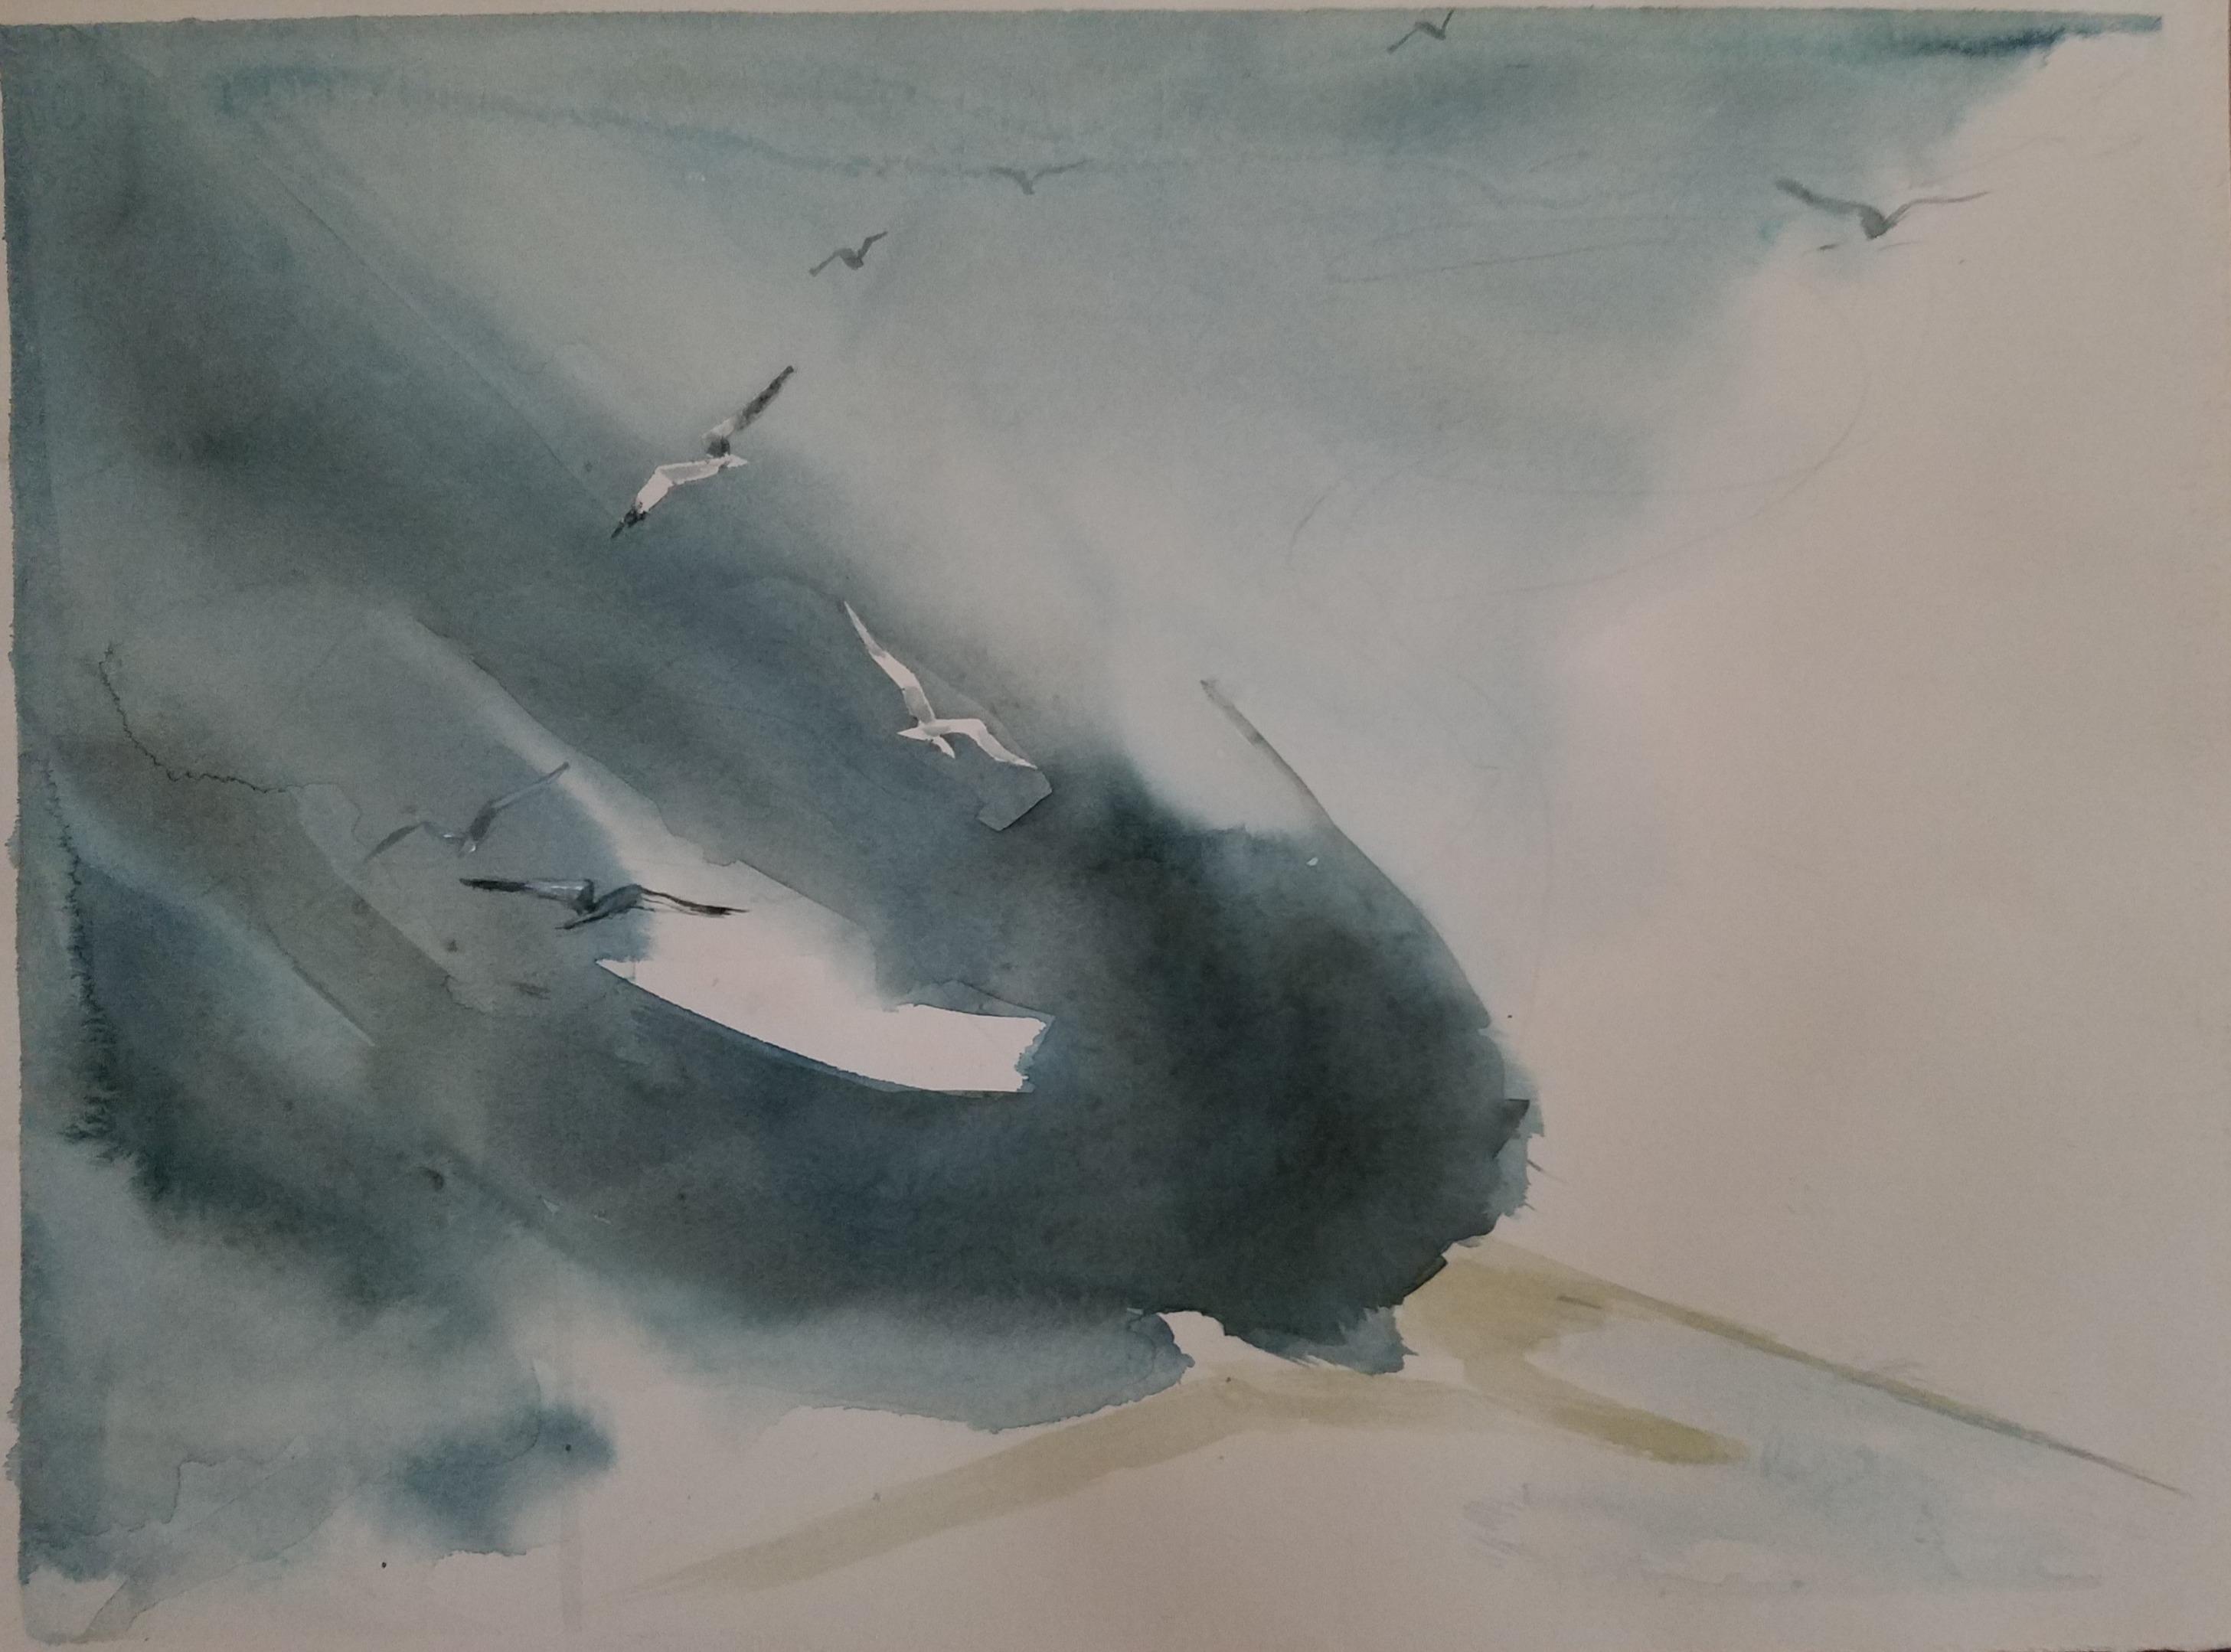 Gulls in the spray